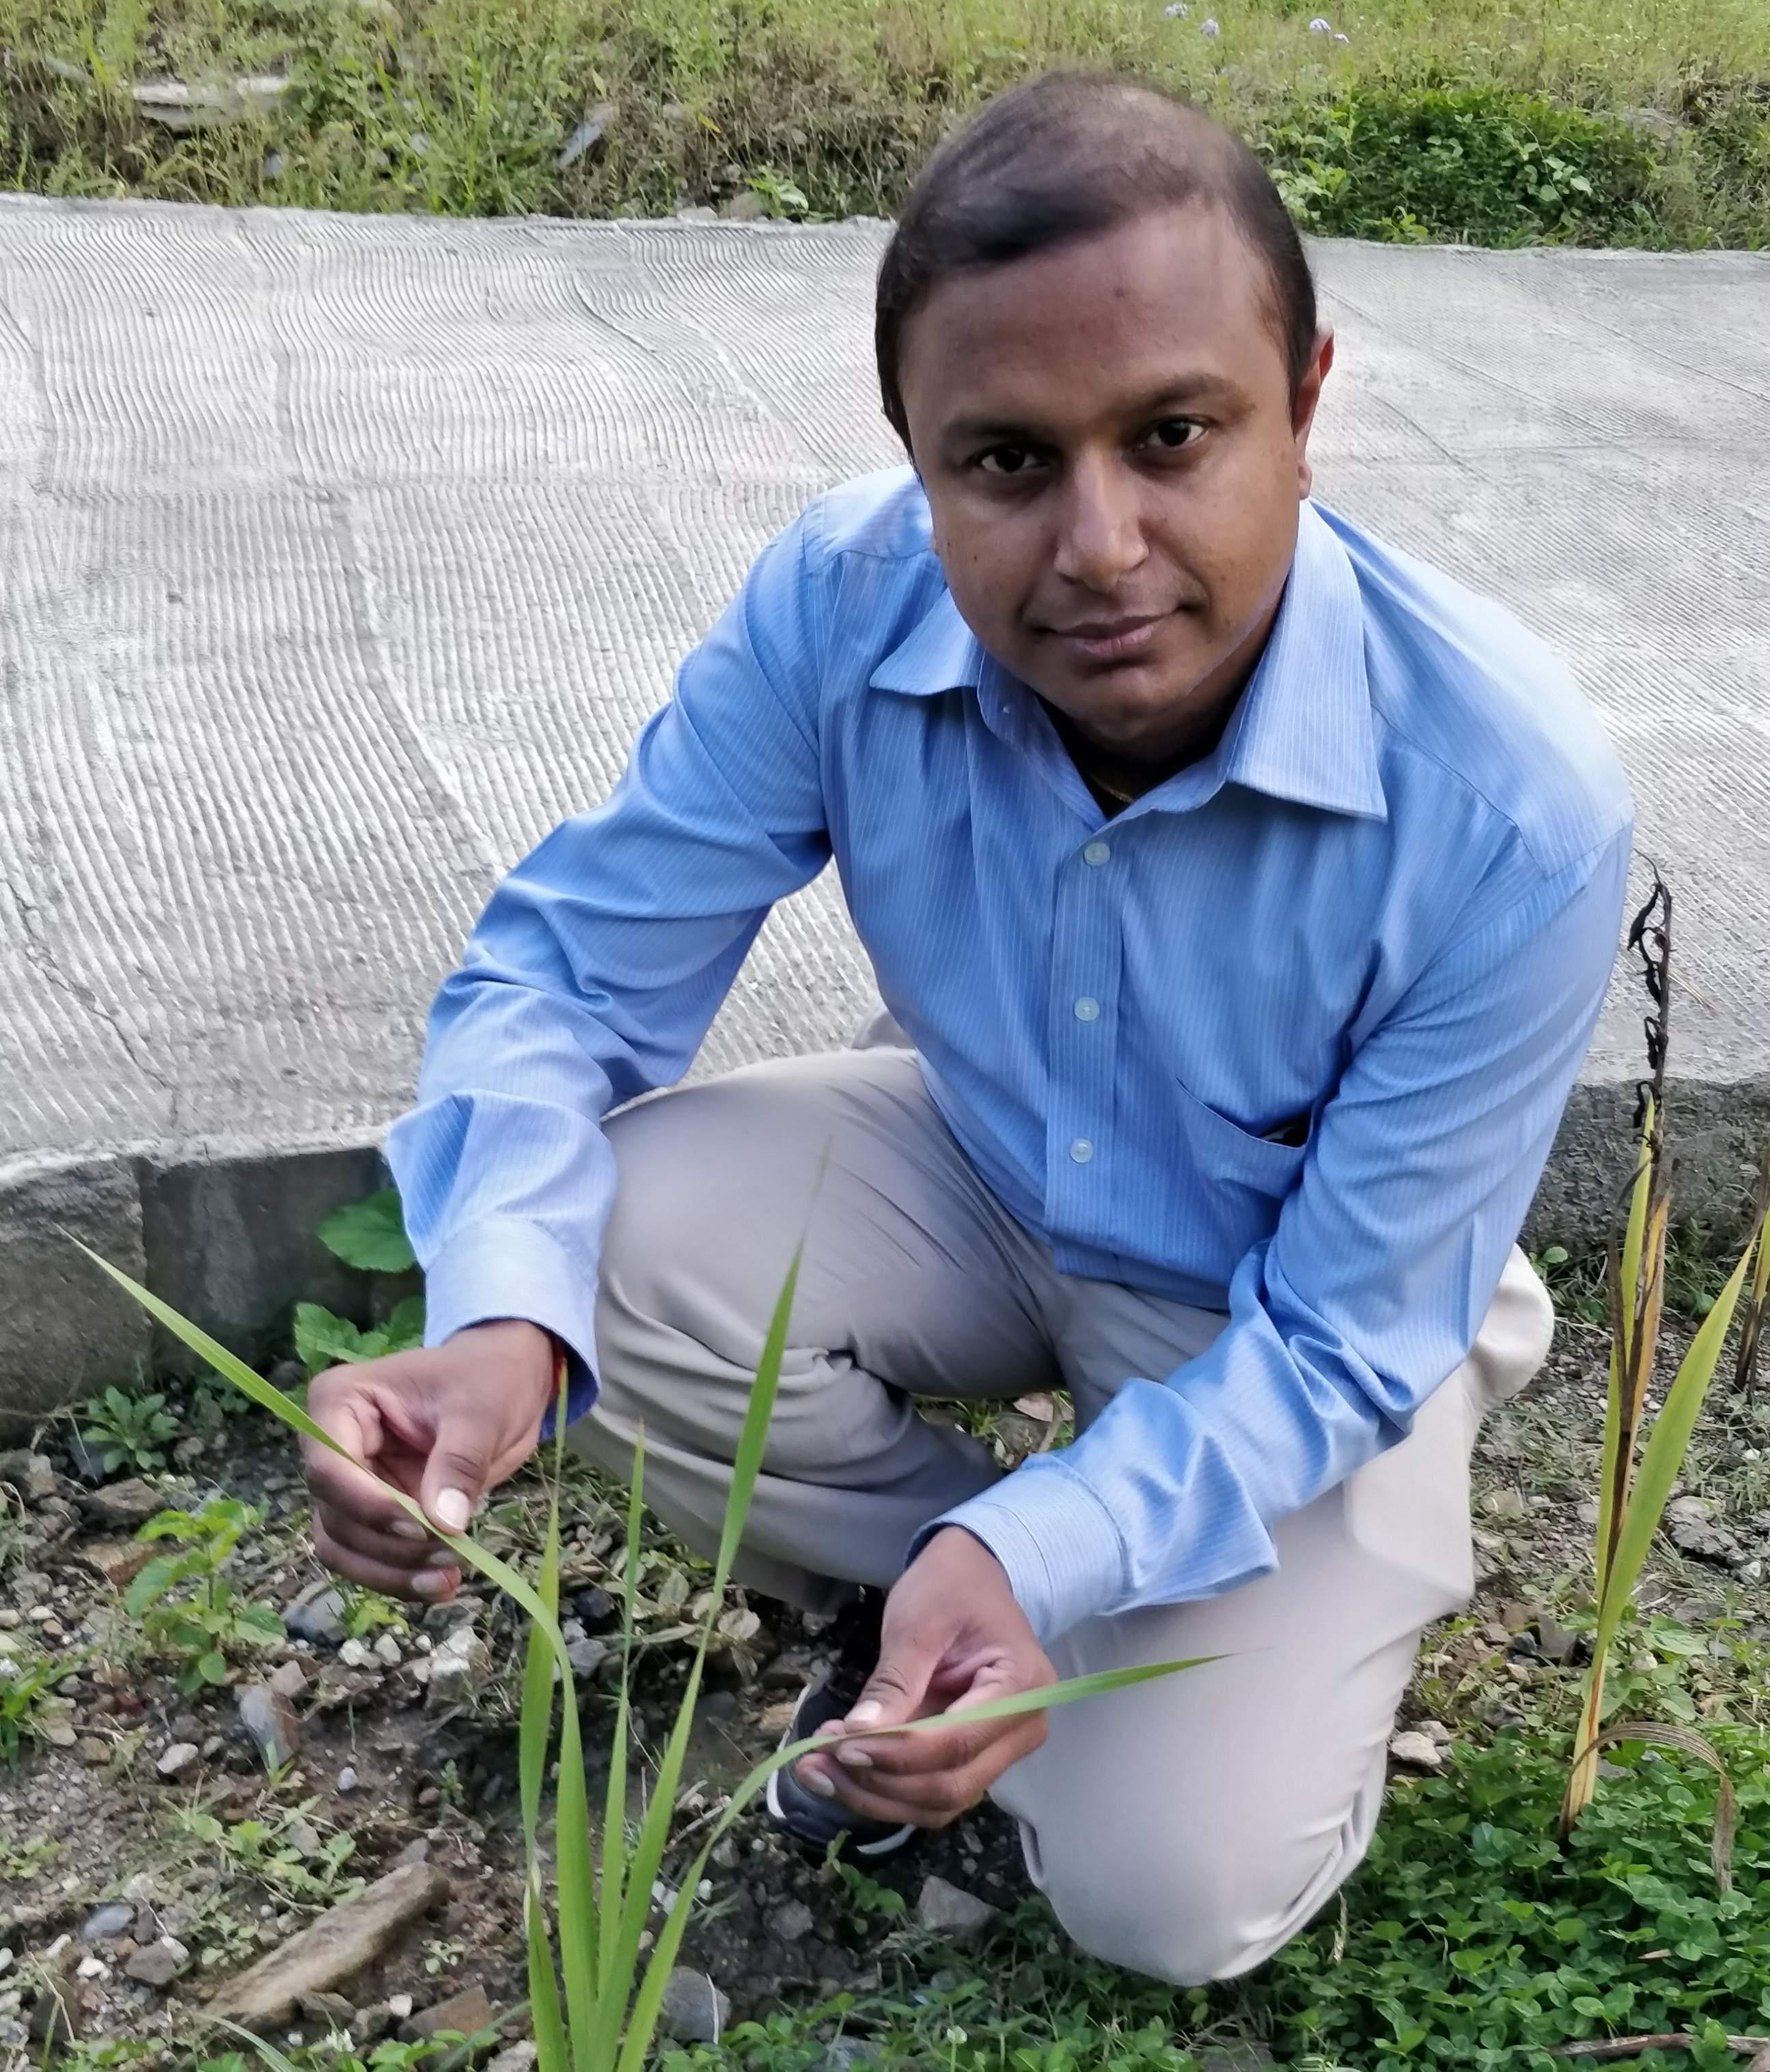 Research team leader Dr Krishnan. Image via EDexLive